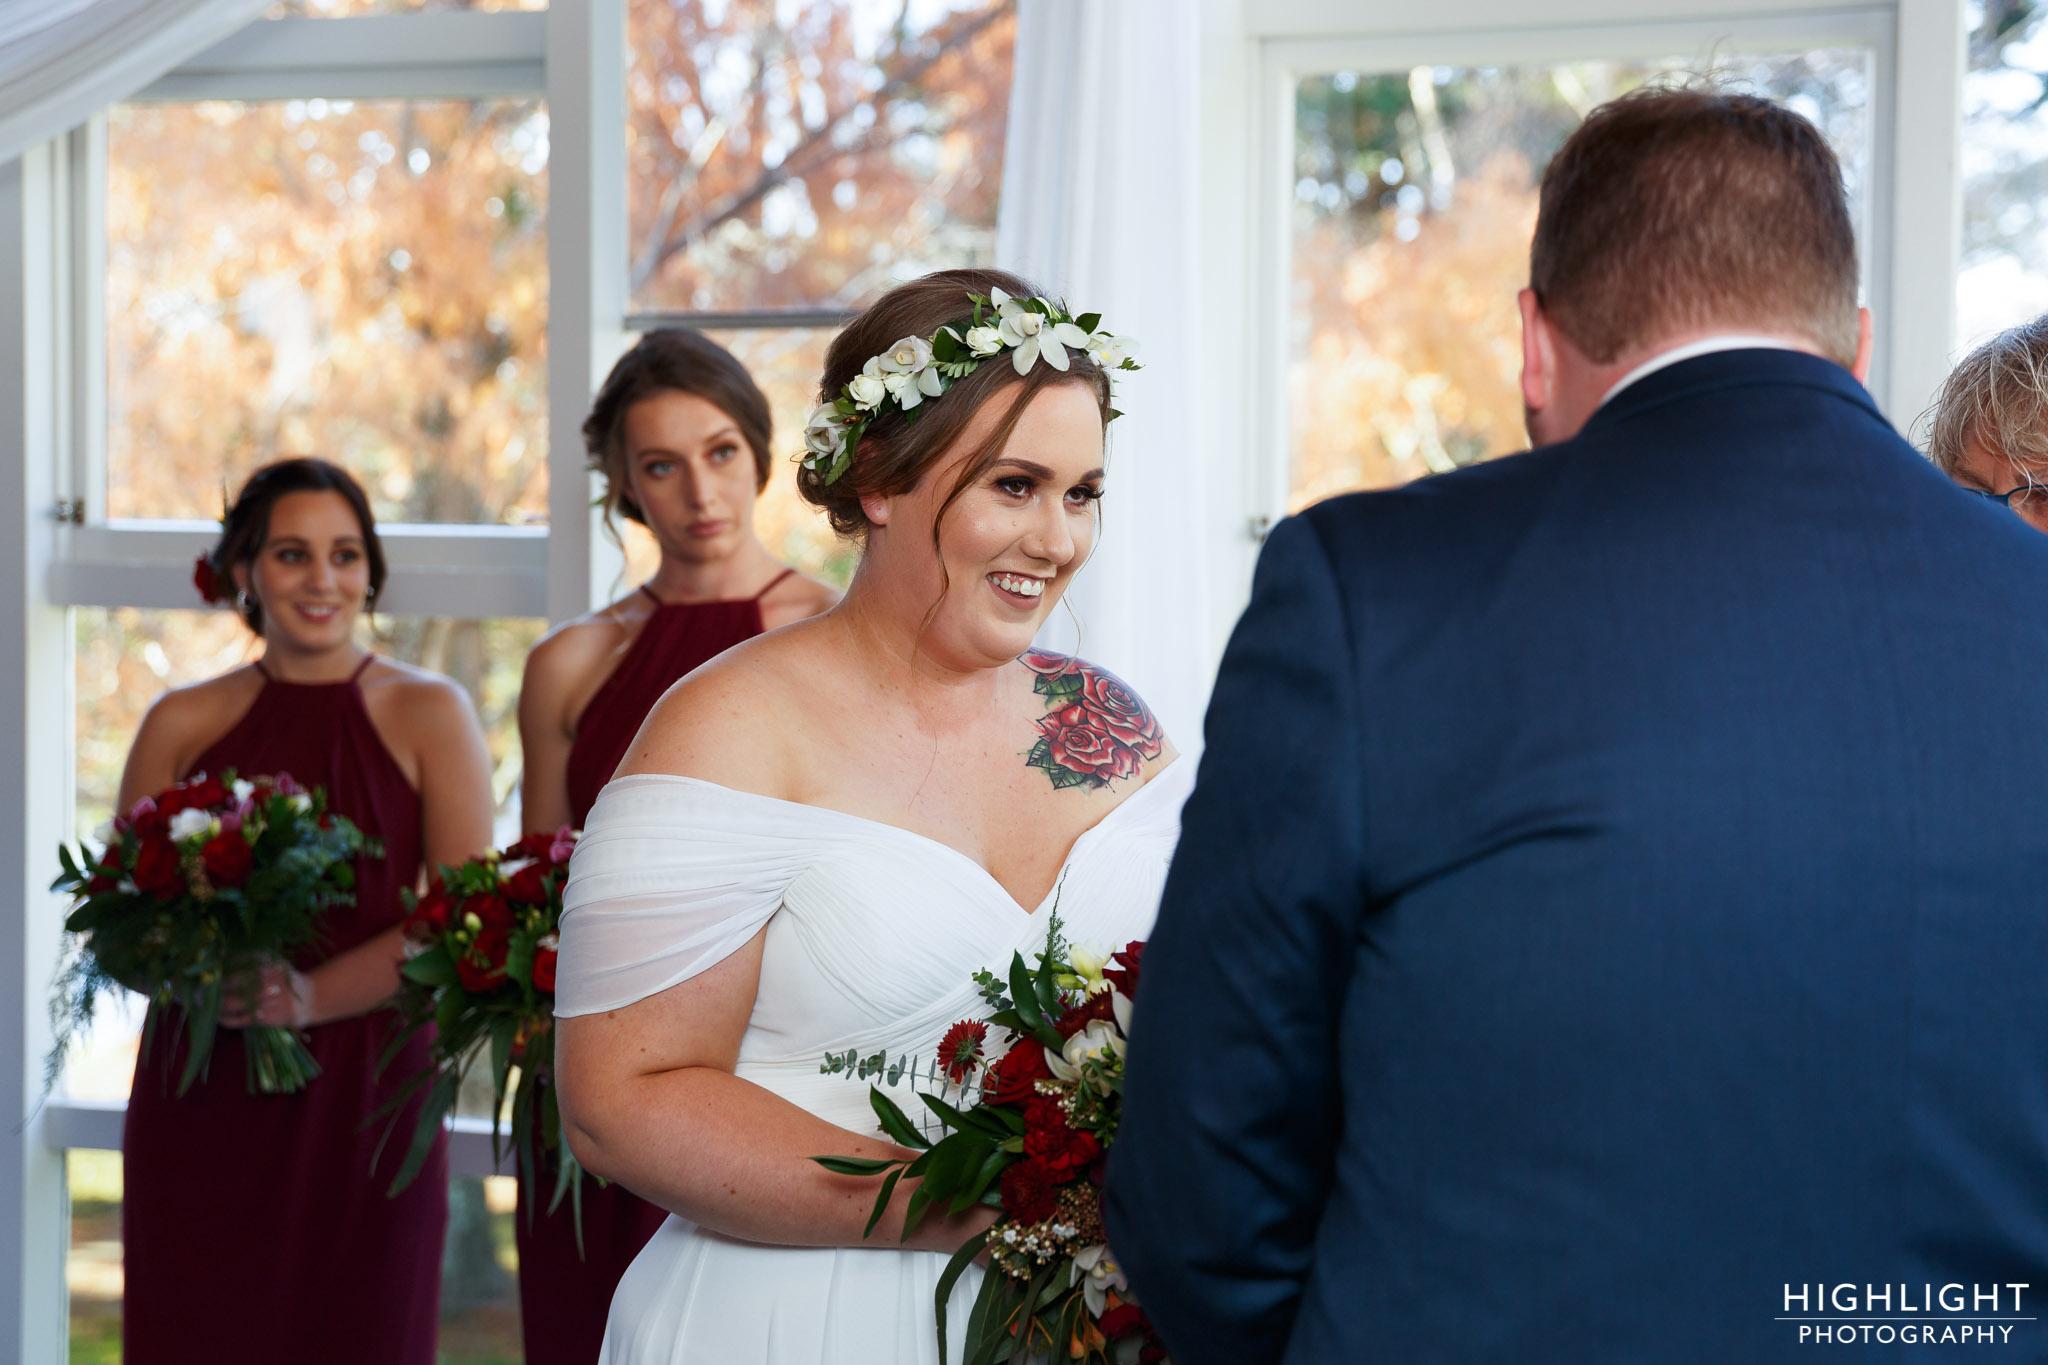 Highlight-wedding-photography-new-zealand-palmerston-north-52.jpg